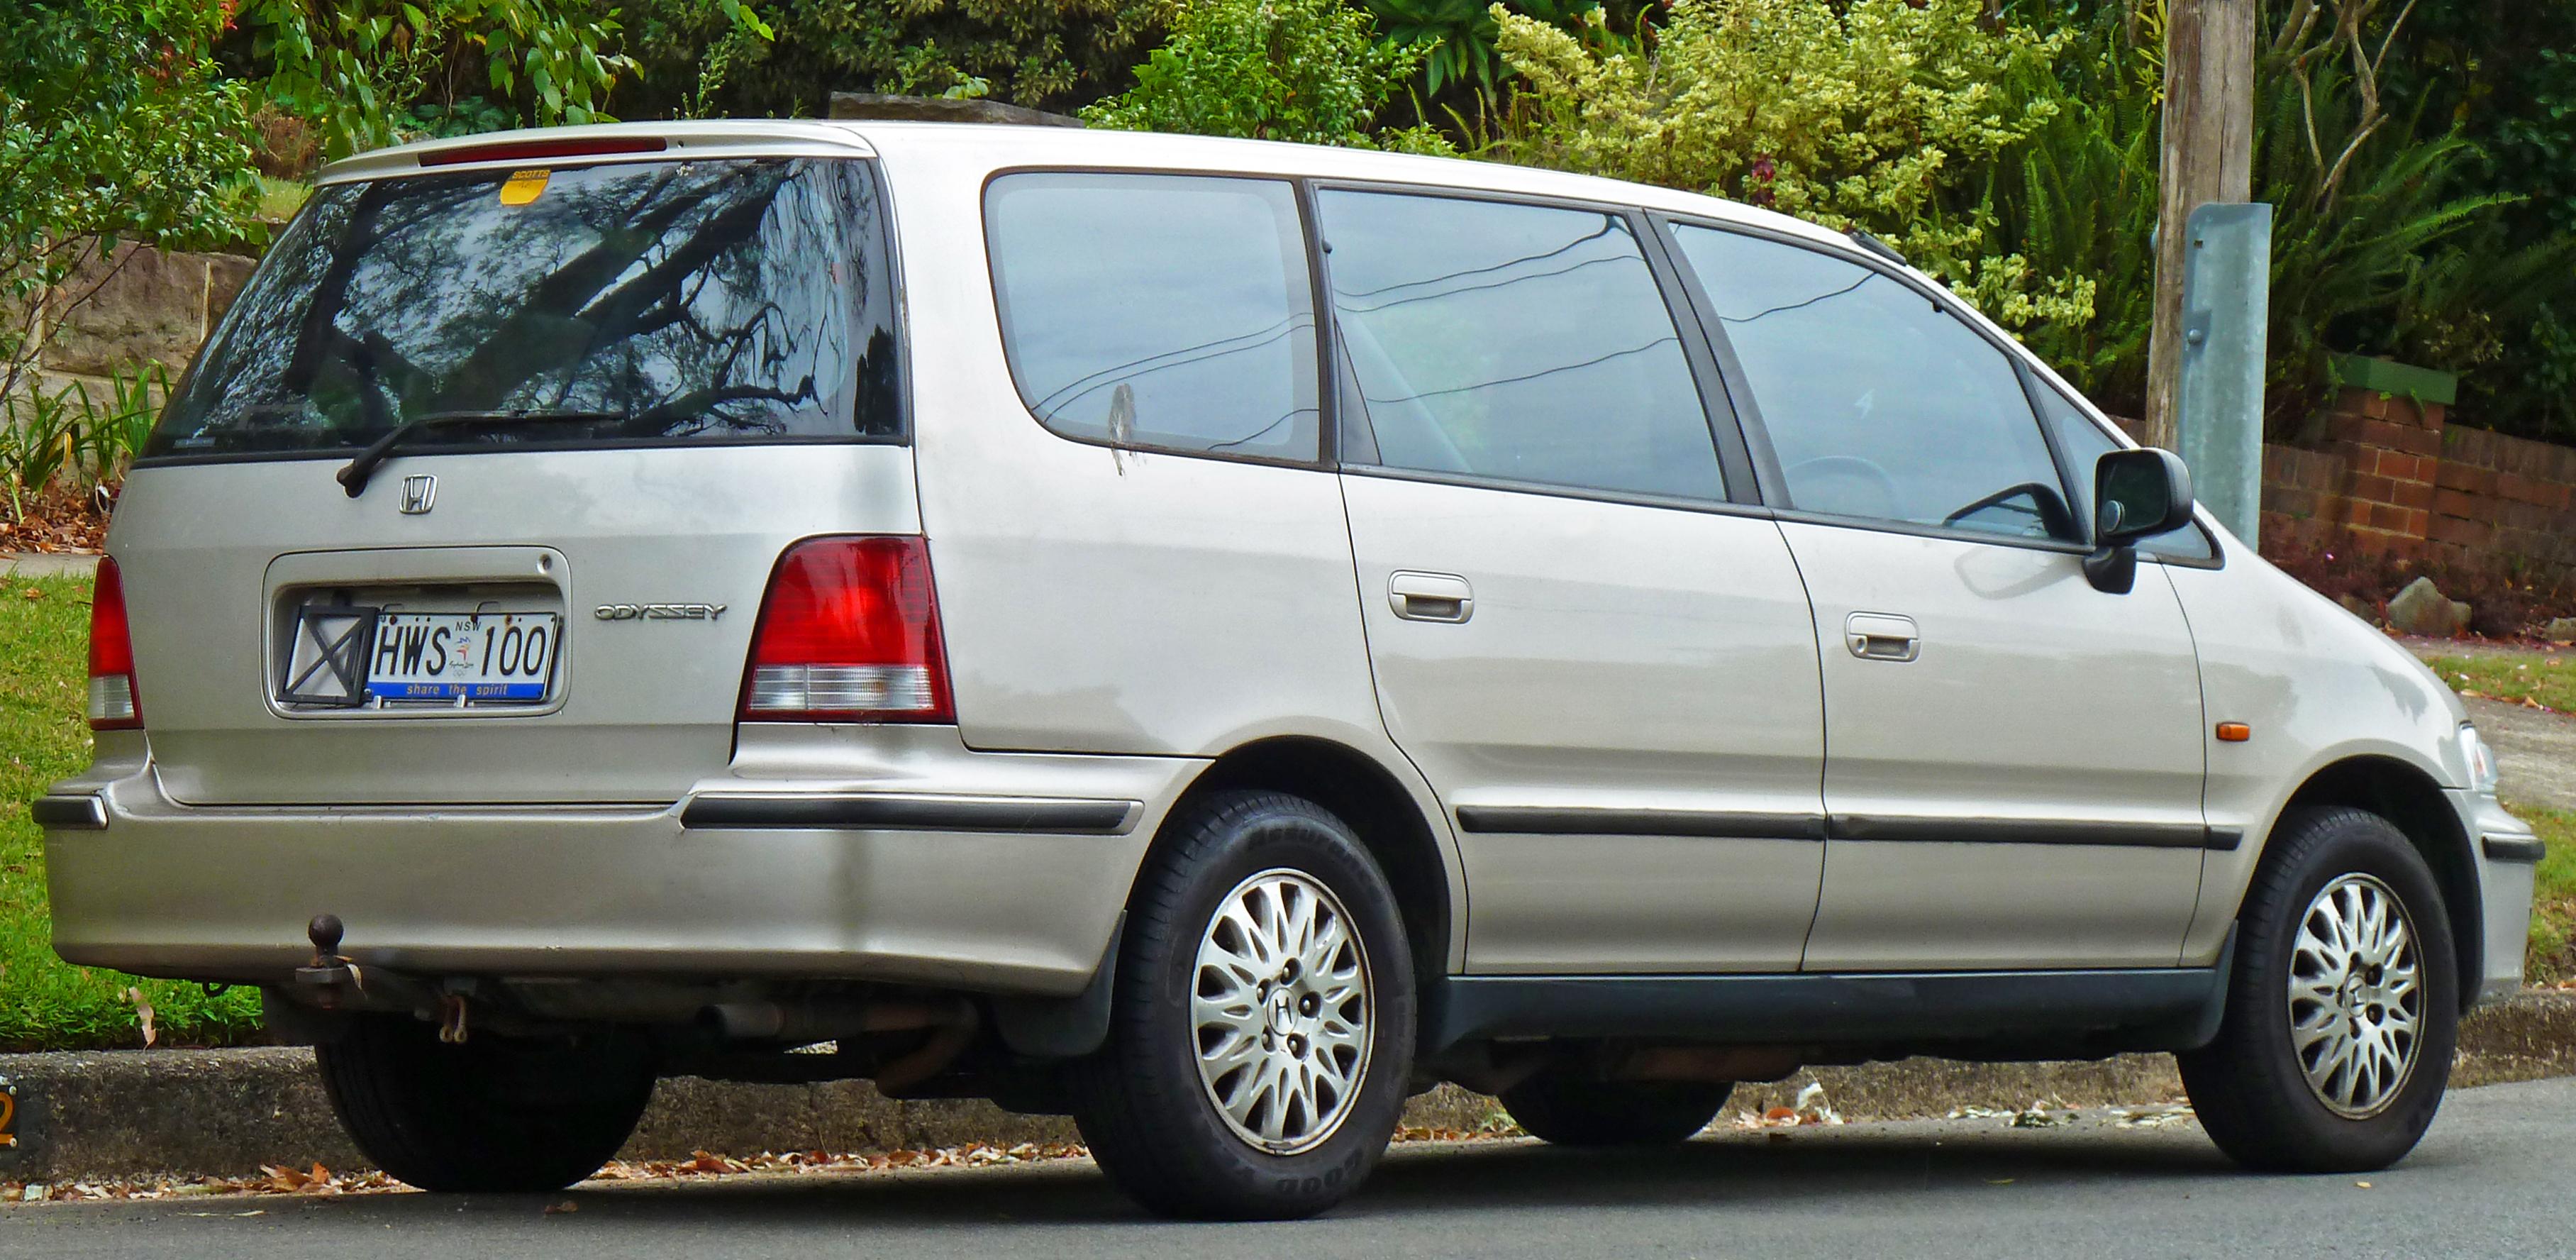 Honda Odyssey Fl570r For Sale Autos Post